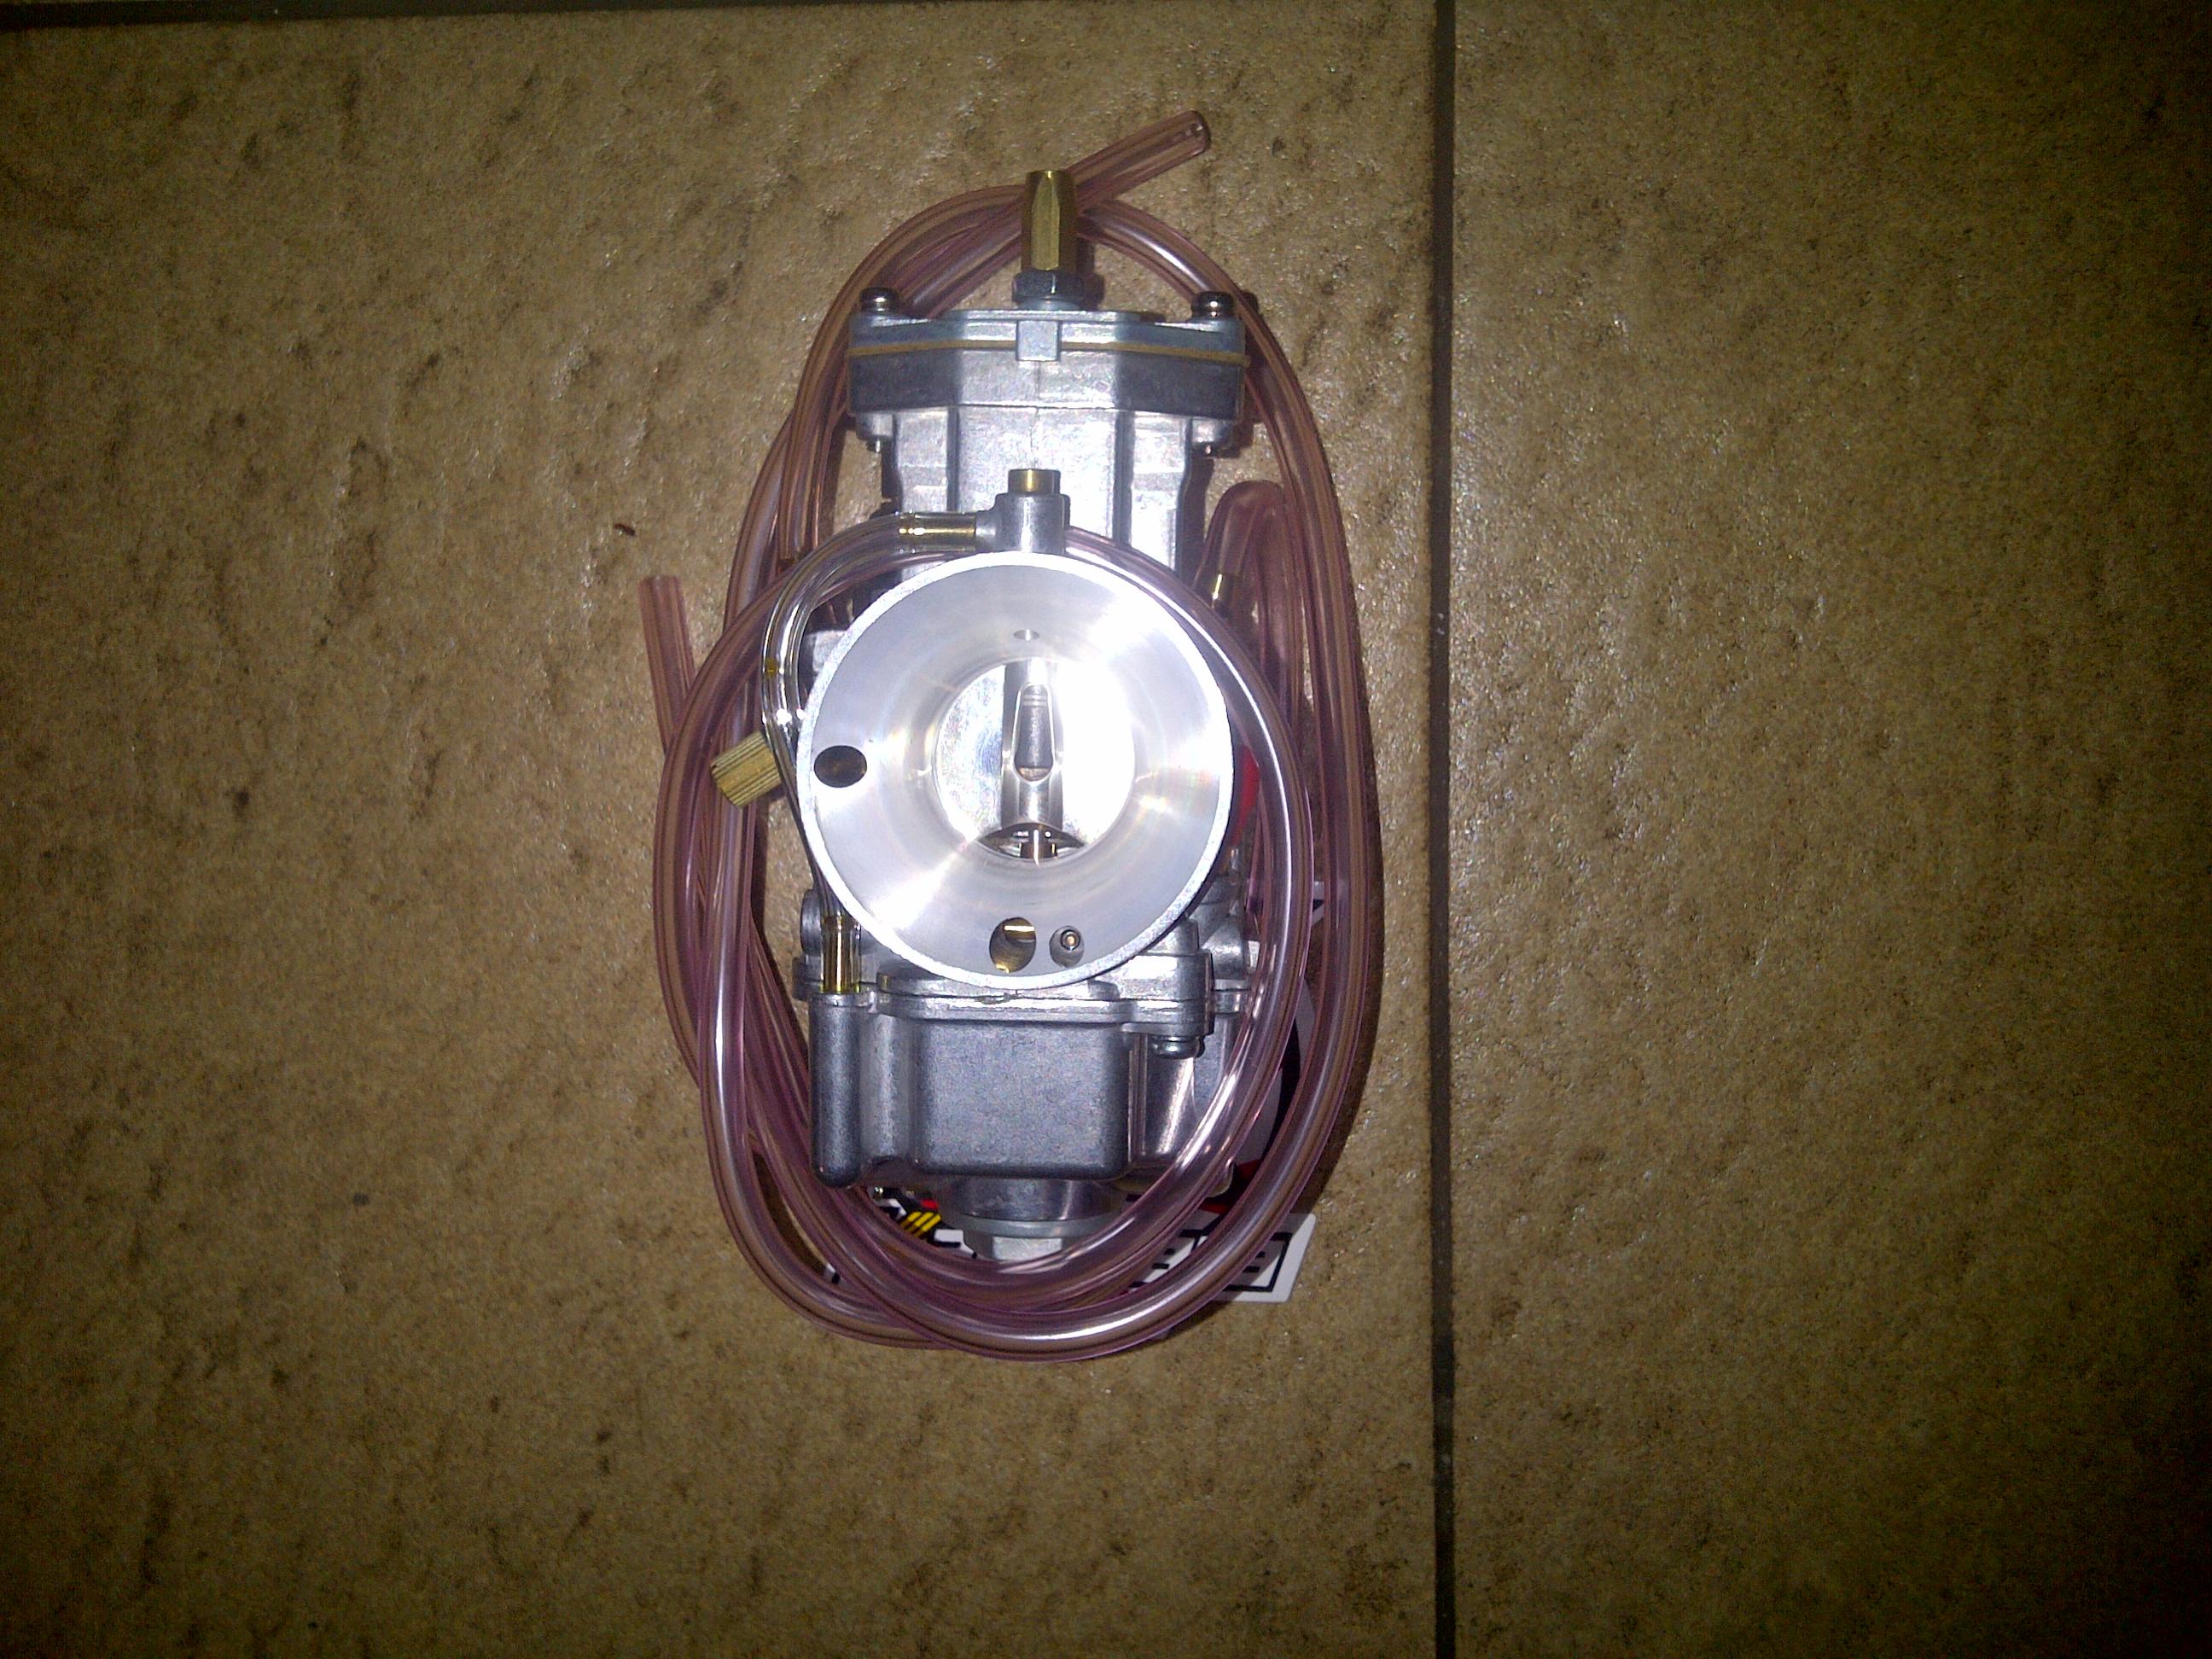 IMG 20130524 00369 Jual karburator pwk 28